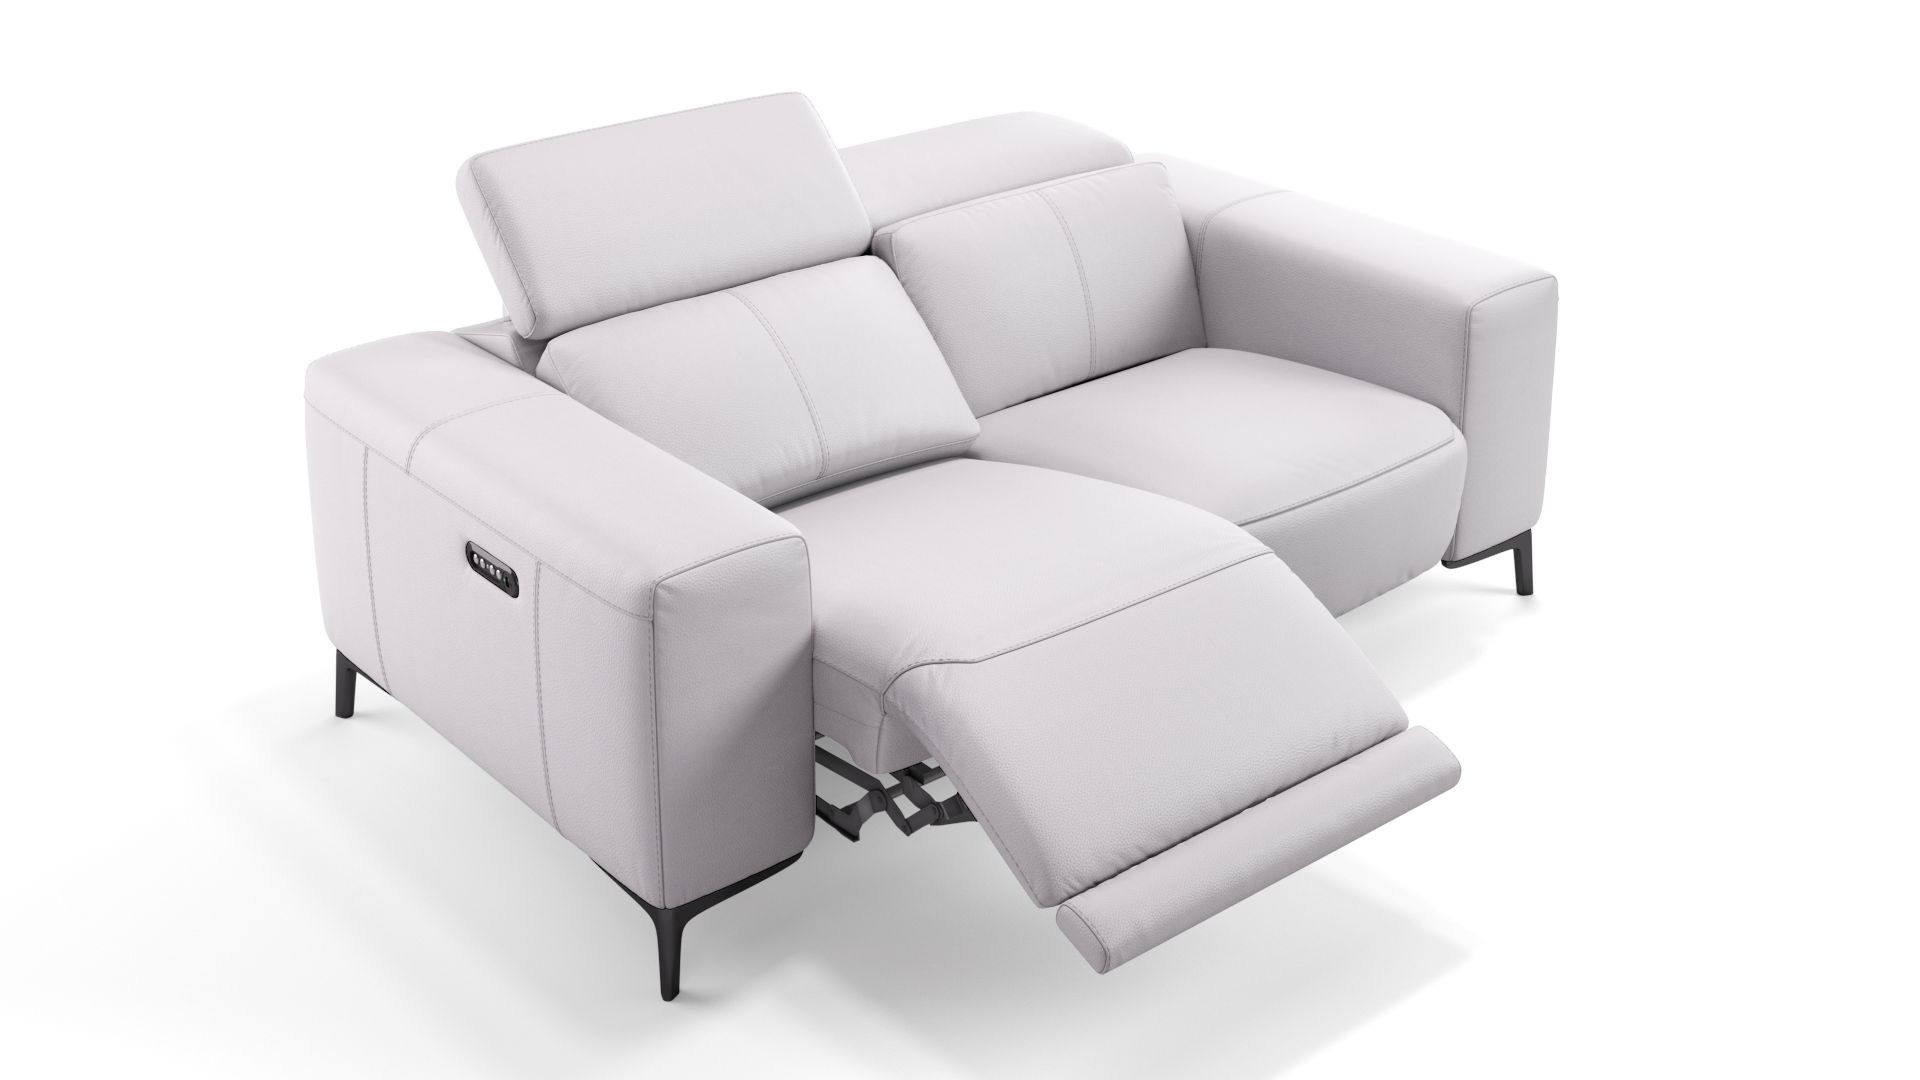 Leder 2-Sitzer Sofa BORRELLO